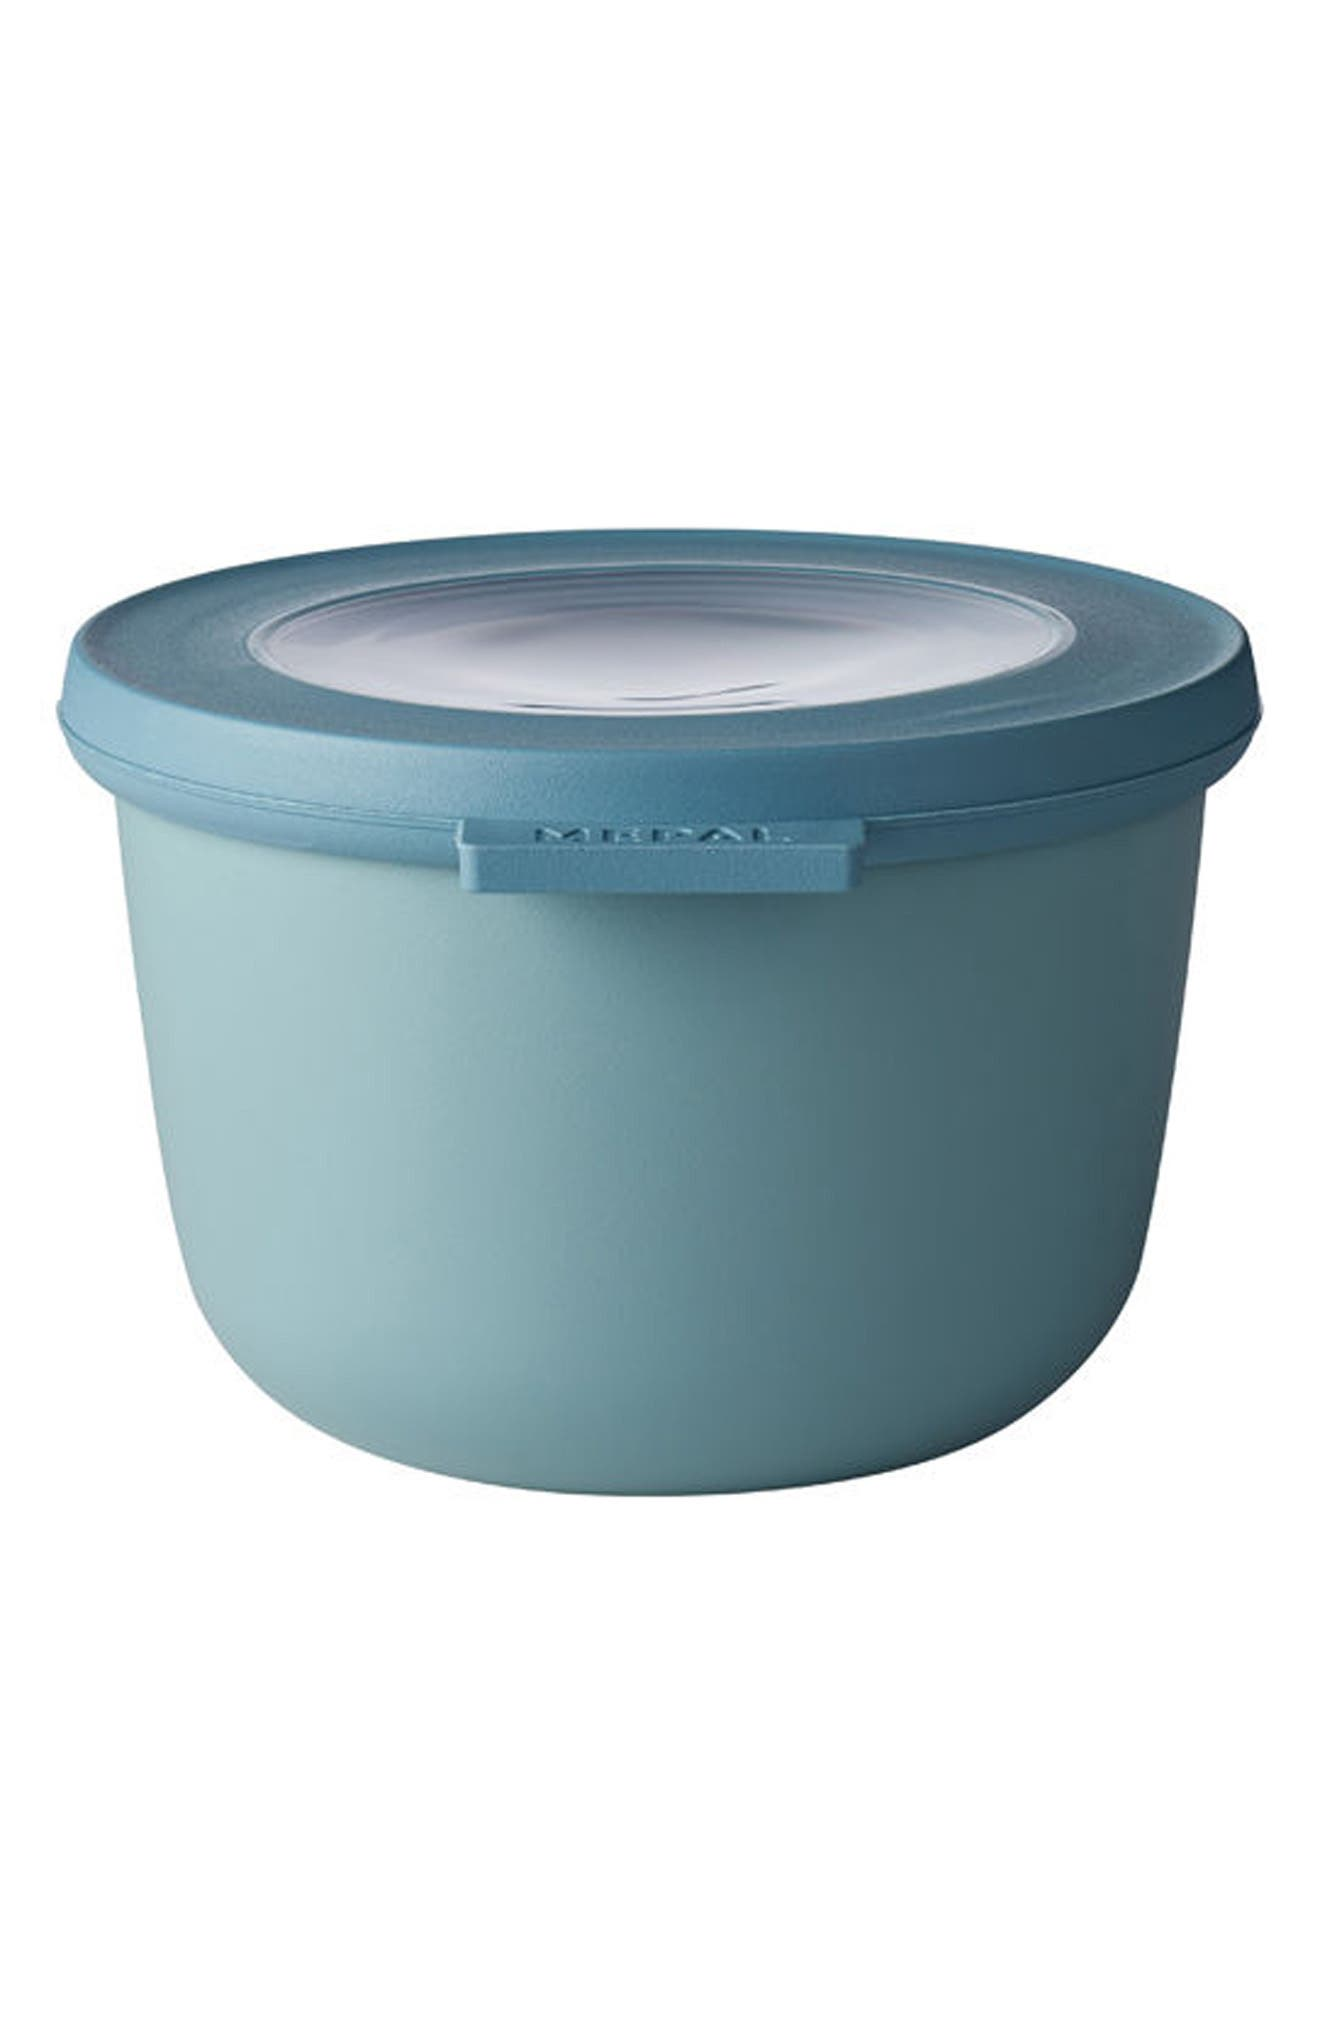 Cirqula Set of 4 Storage Bowls,                             Alternate thumbnail 2, color,                             Blue